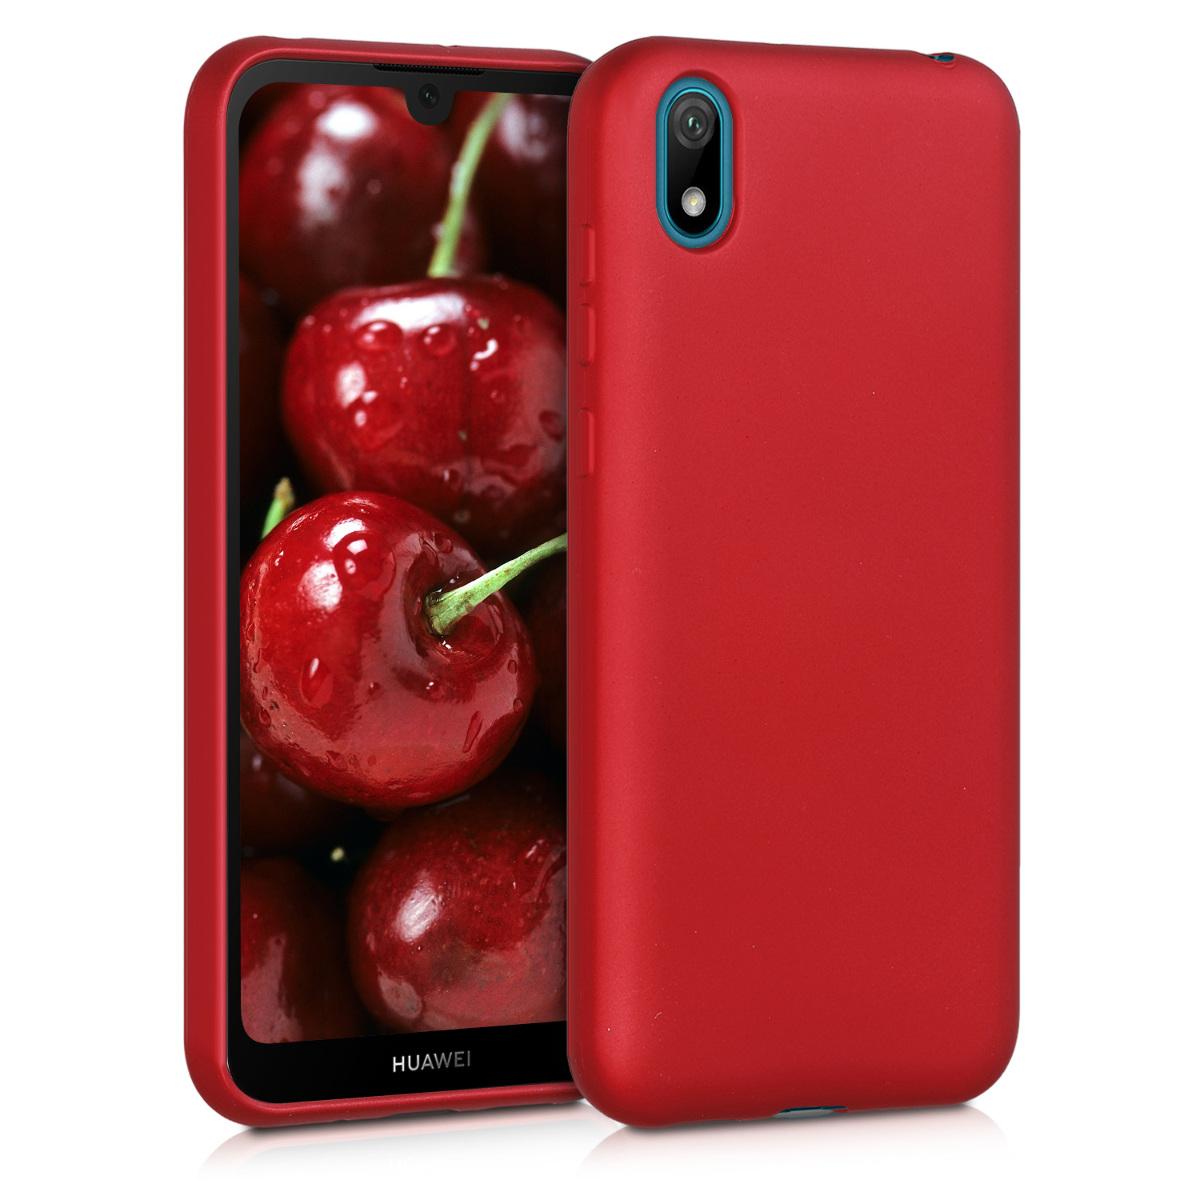 KW Θήκη Σιλικόνης Huawei Y5 2019 - Metallic Dark Red (50749.36)